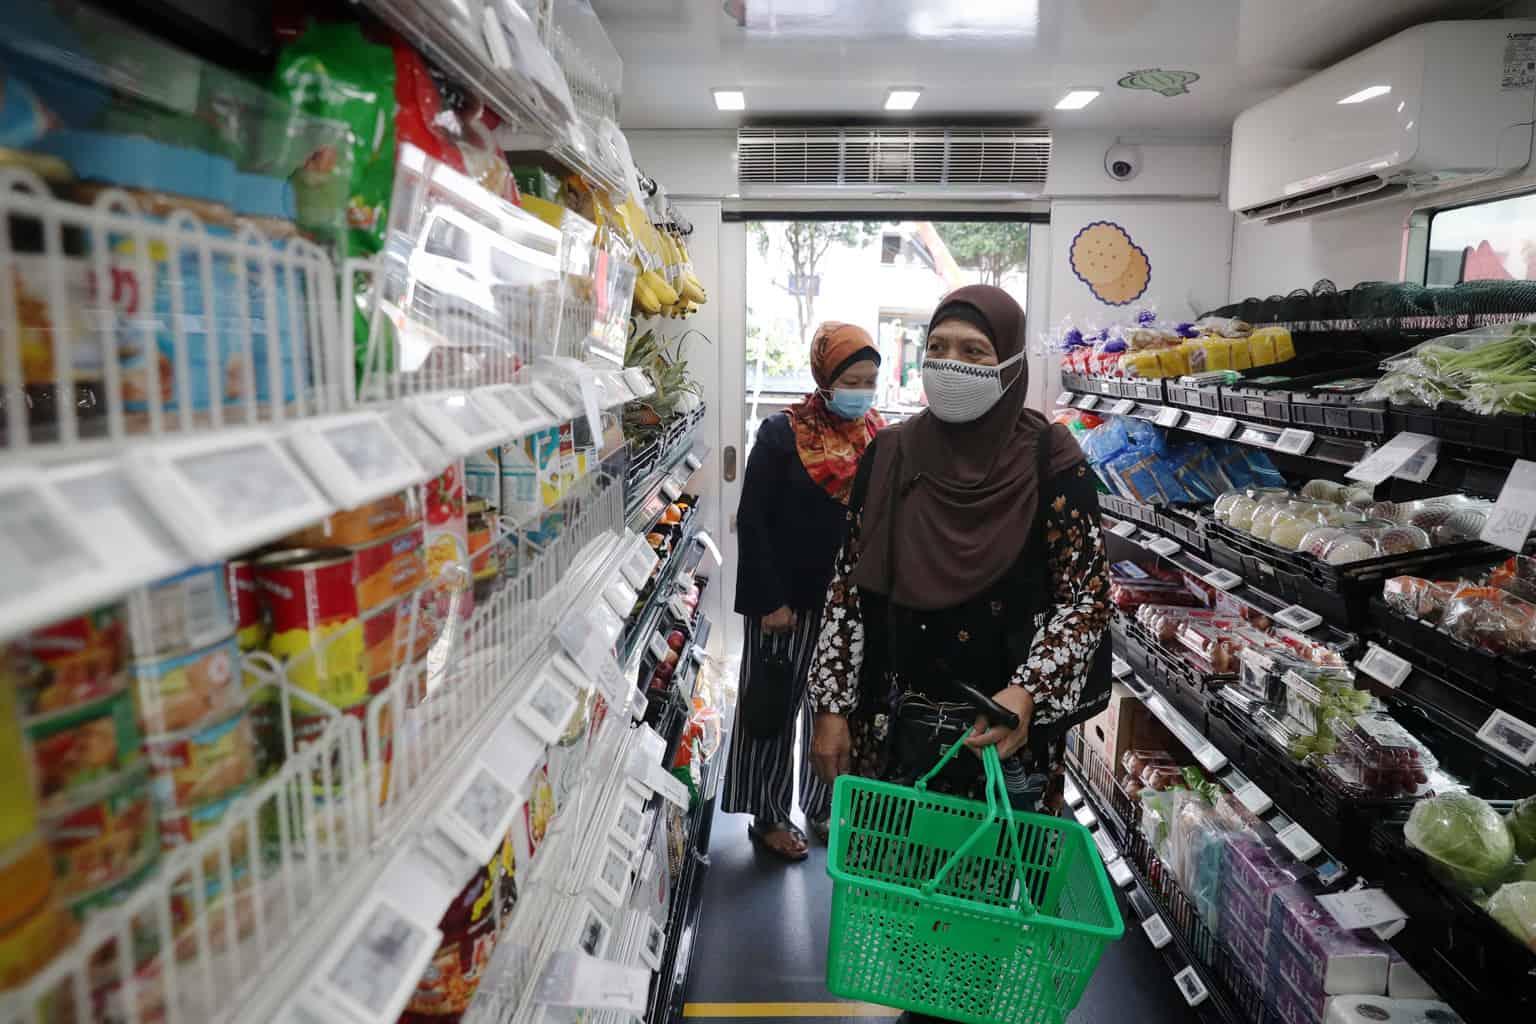 Fairprice, FairPrice on Wheels: Supermarkets made convenient for seniors